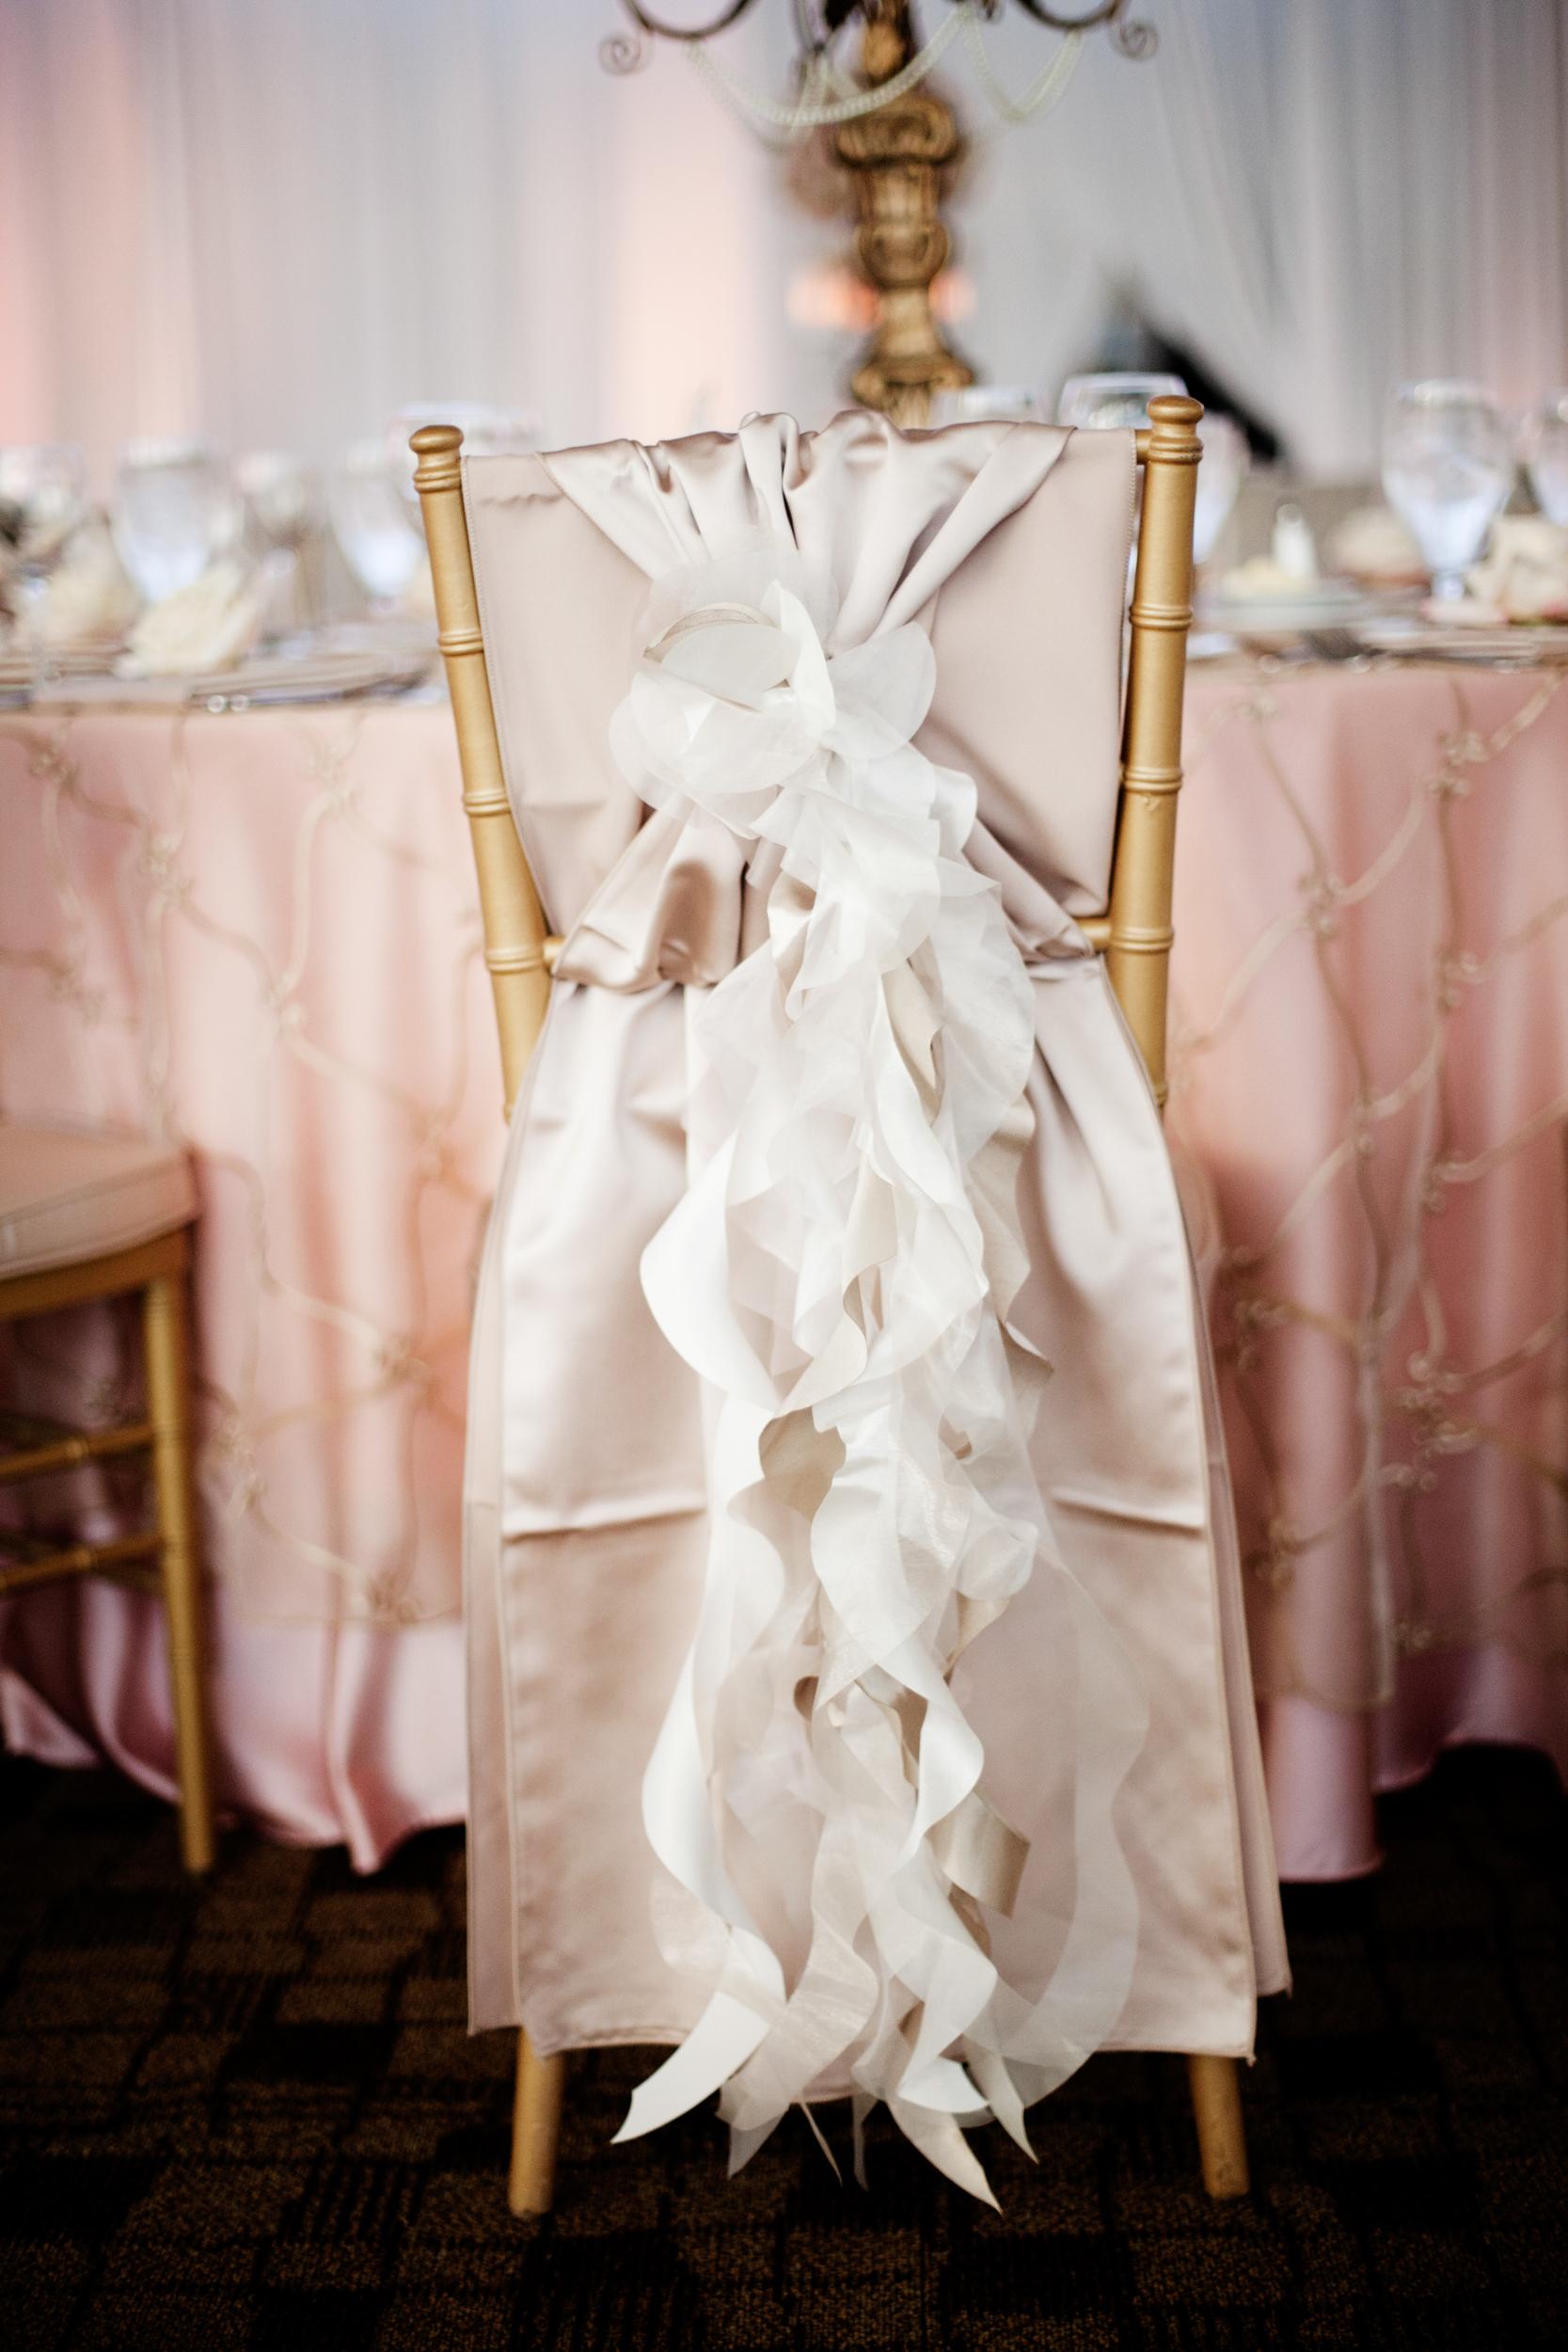 Ceci_New_York_Ceci_Style_Ceci_Johnson_Luxury_Lifestyle_Floral_Lace_Wedding_Letterpress_Inspiration_Design_Custom_Couture_Personalized_Invitations_-106.jpg